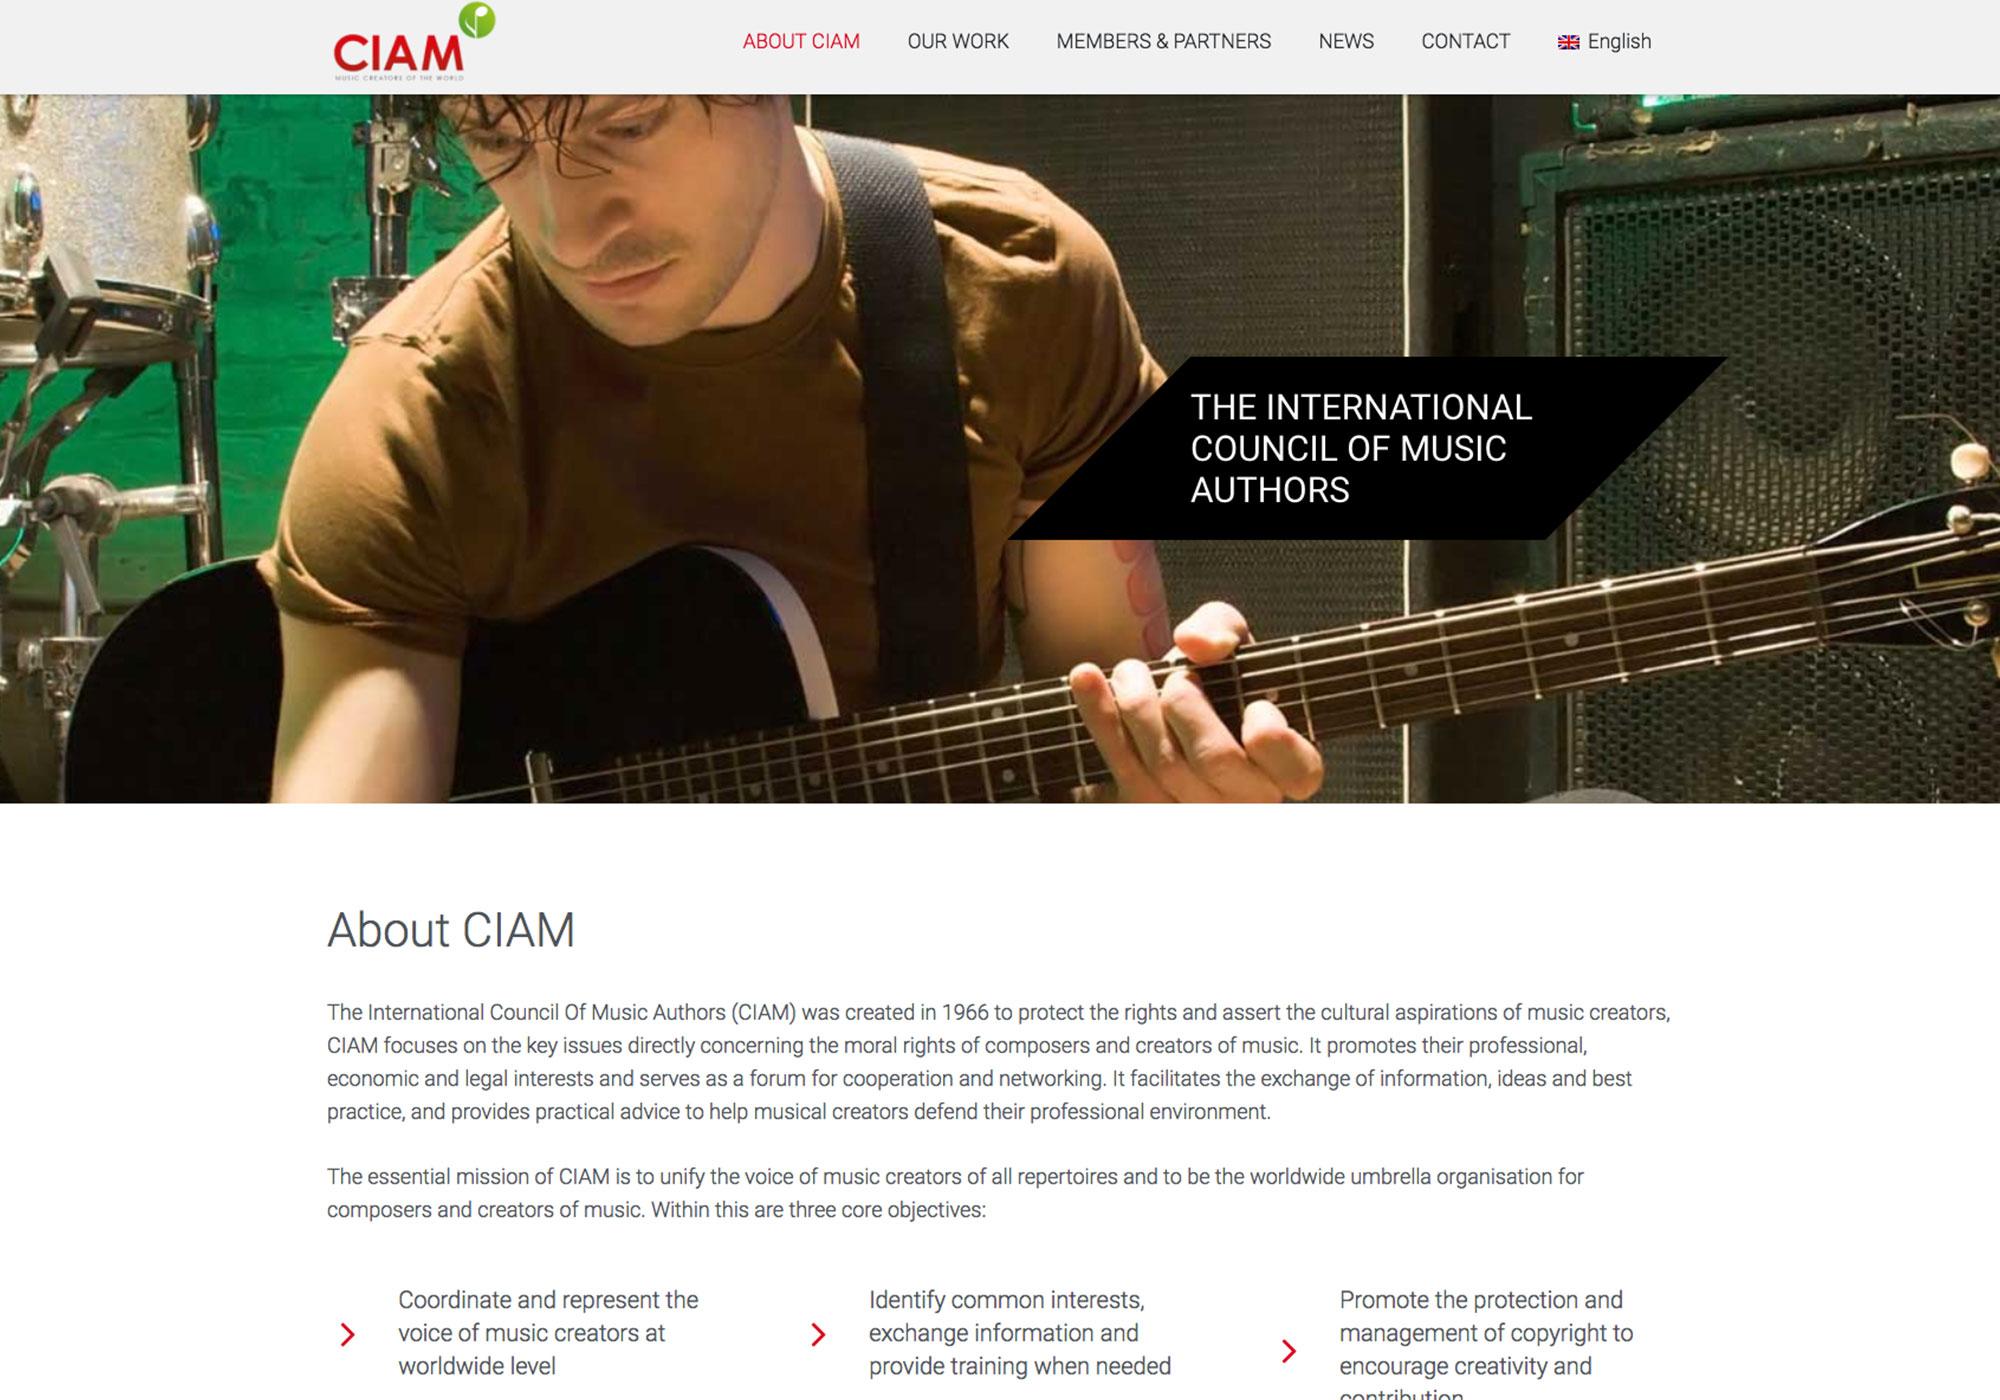 Fairness Rocks News International Council of Music Authors (CIAM)